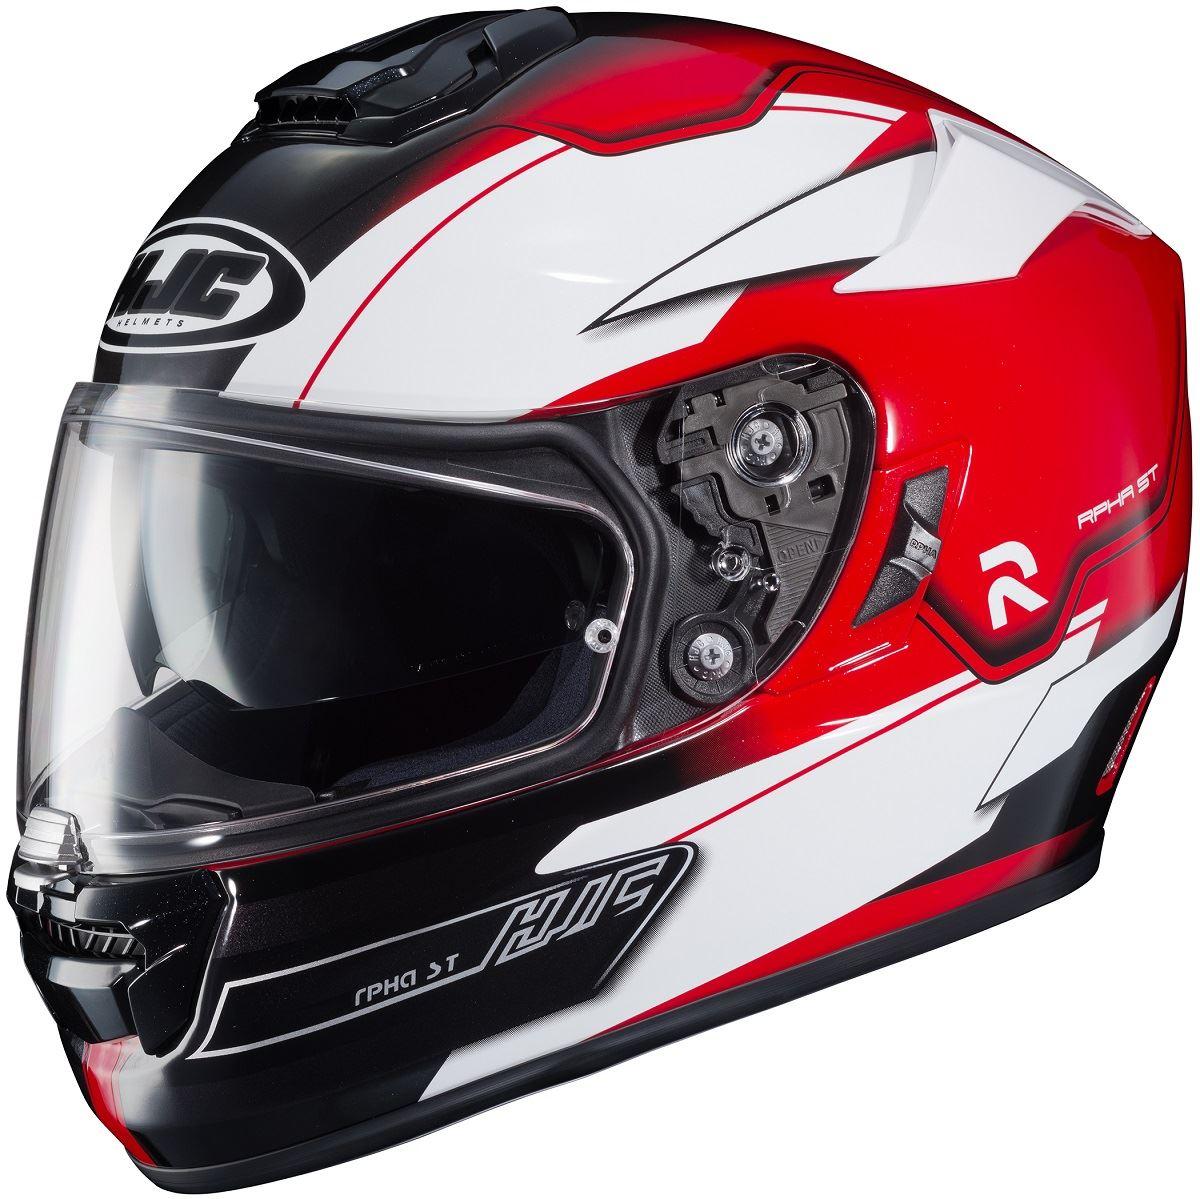 hjc rpha st zaytun full face motorcycle helmet xs s m l xl xxl. Black Bedroom Furniture Sets. Home Design Ideas